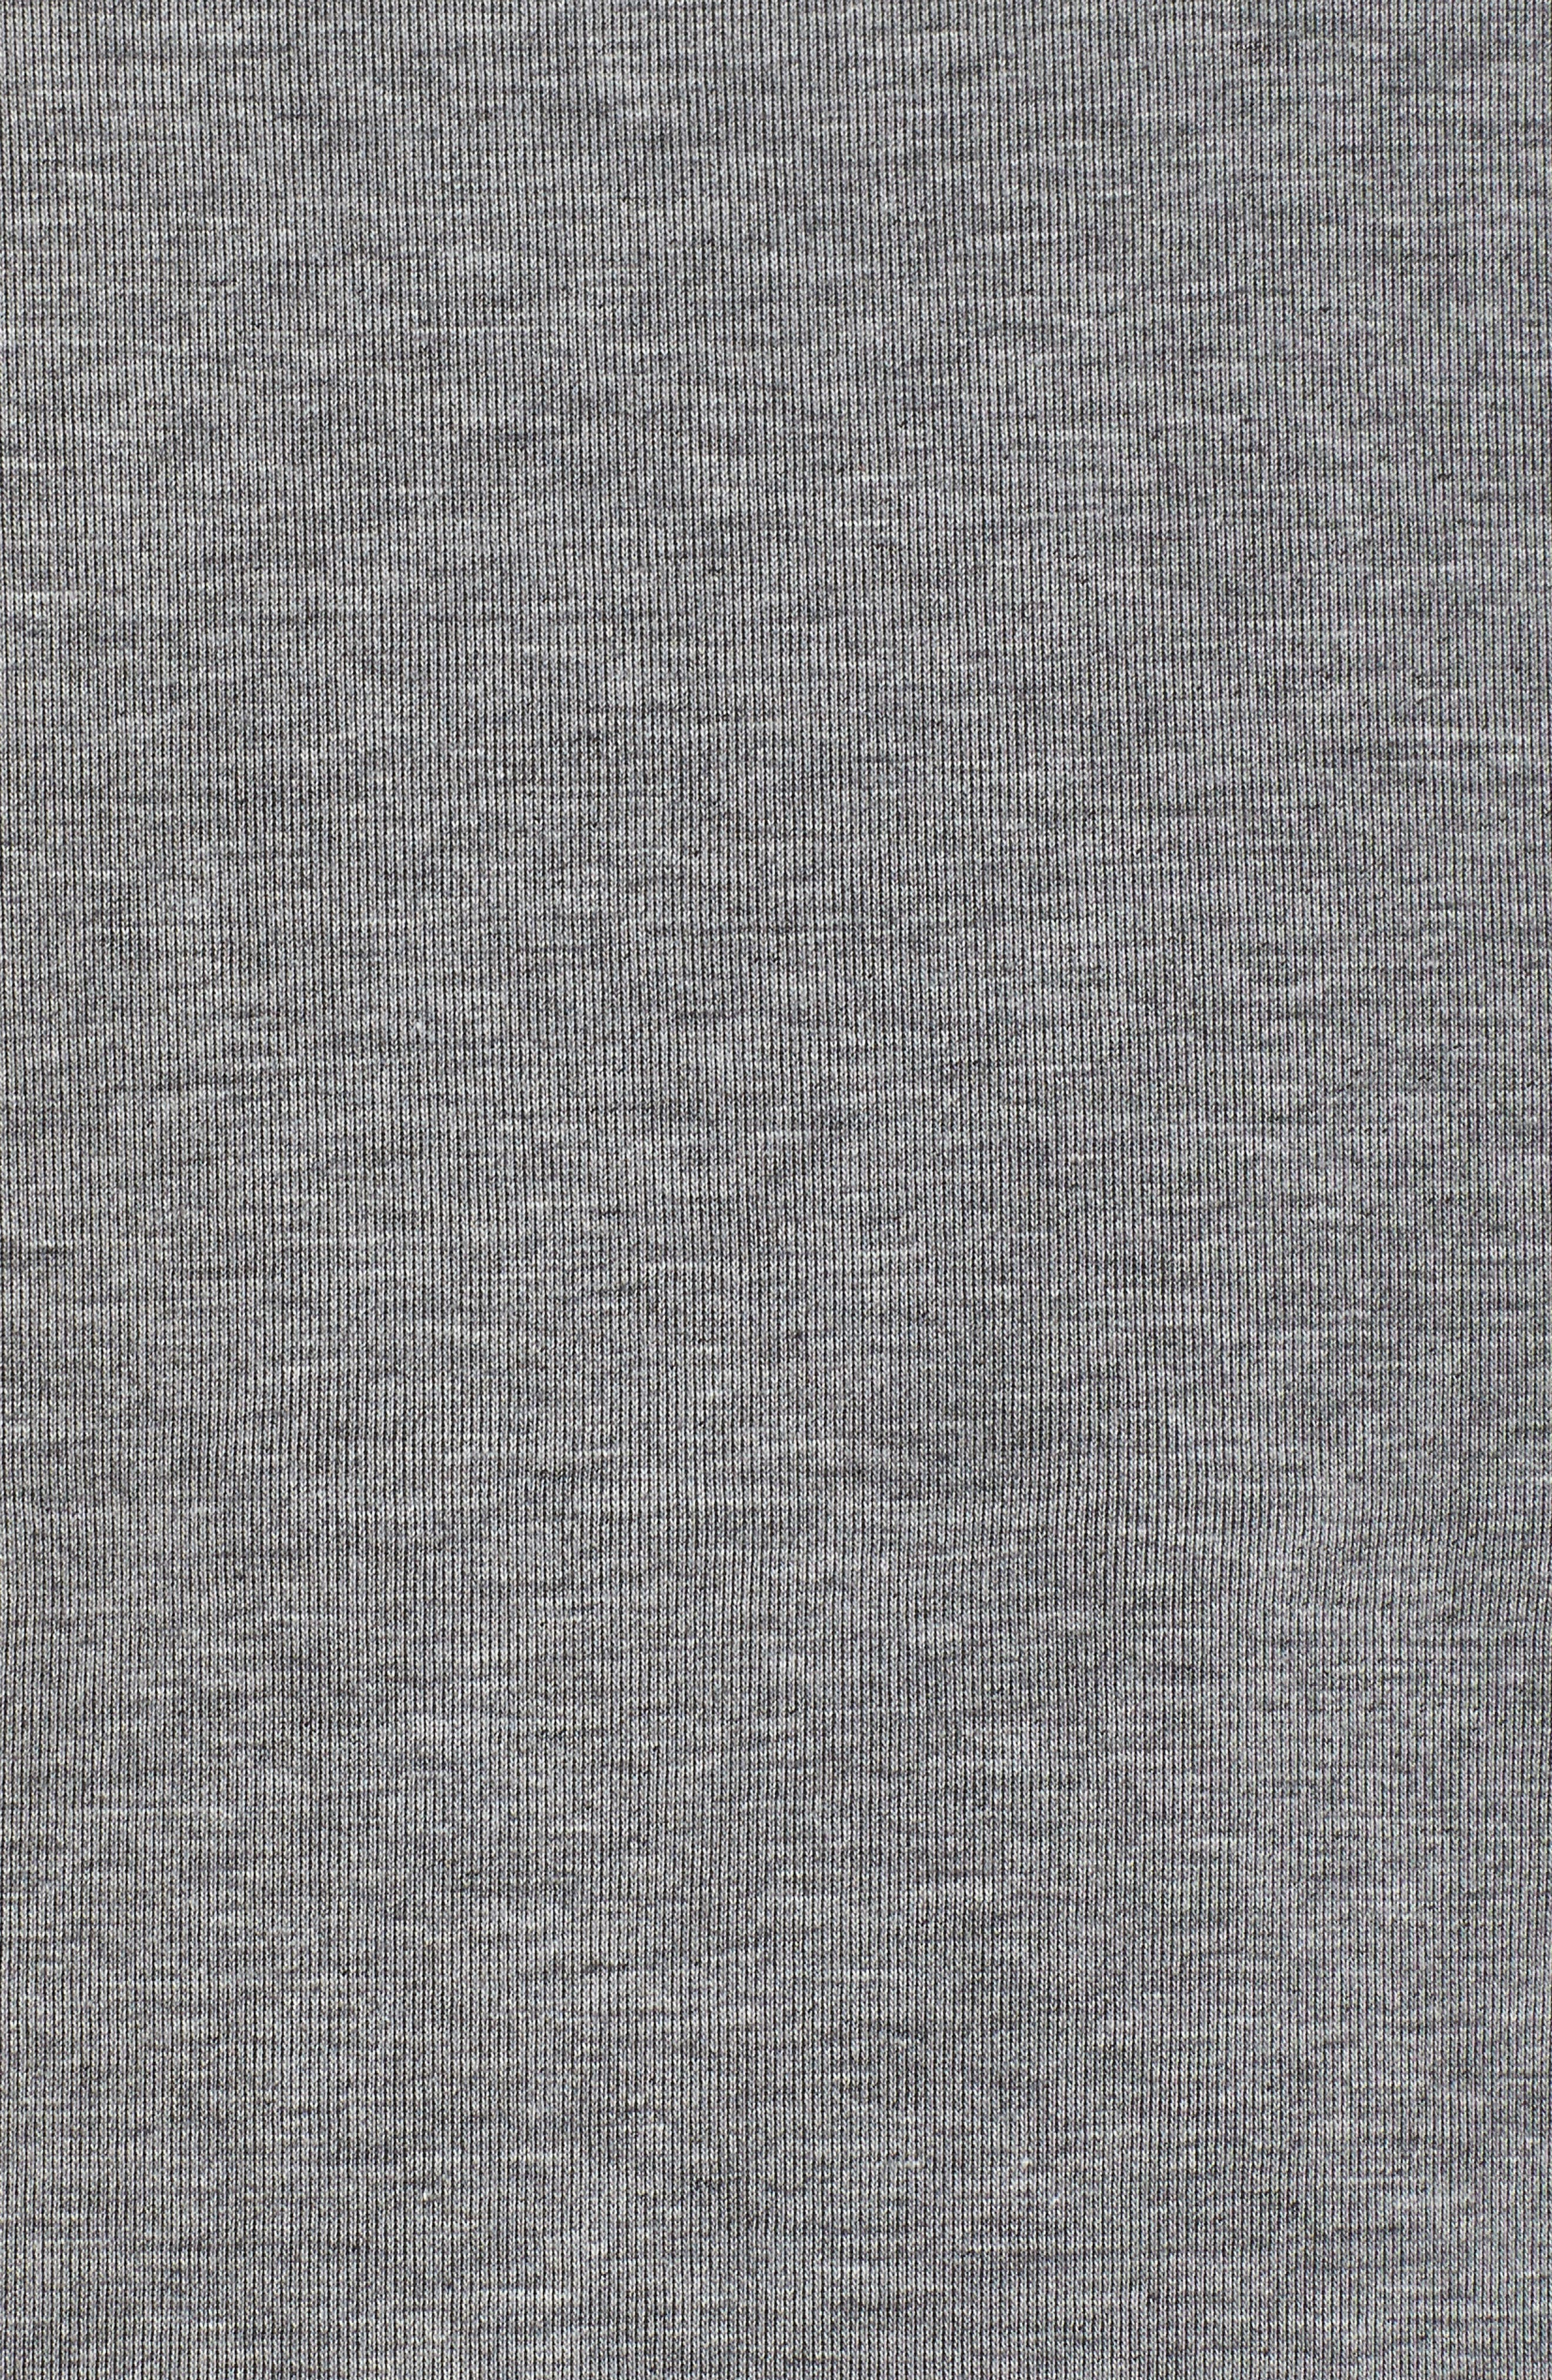 Colorblock Fleece Top,                             Alternate thumbnail 6, color,                             Carbon Heather/ Bone/ Black